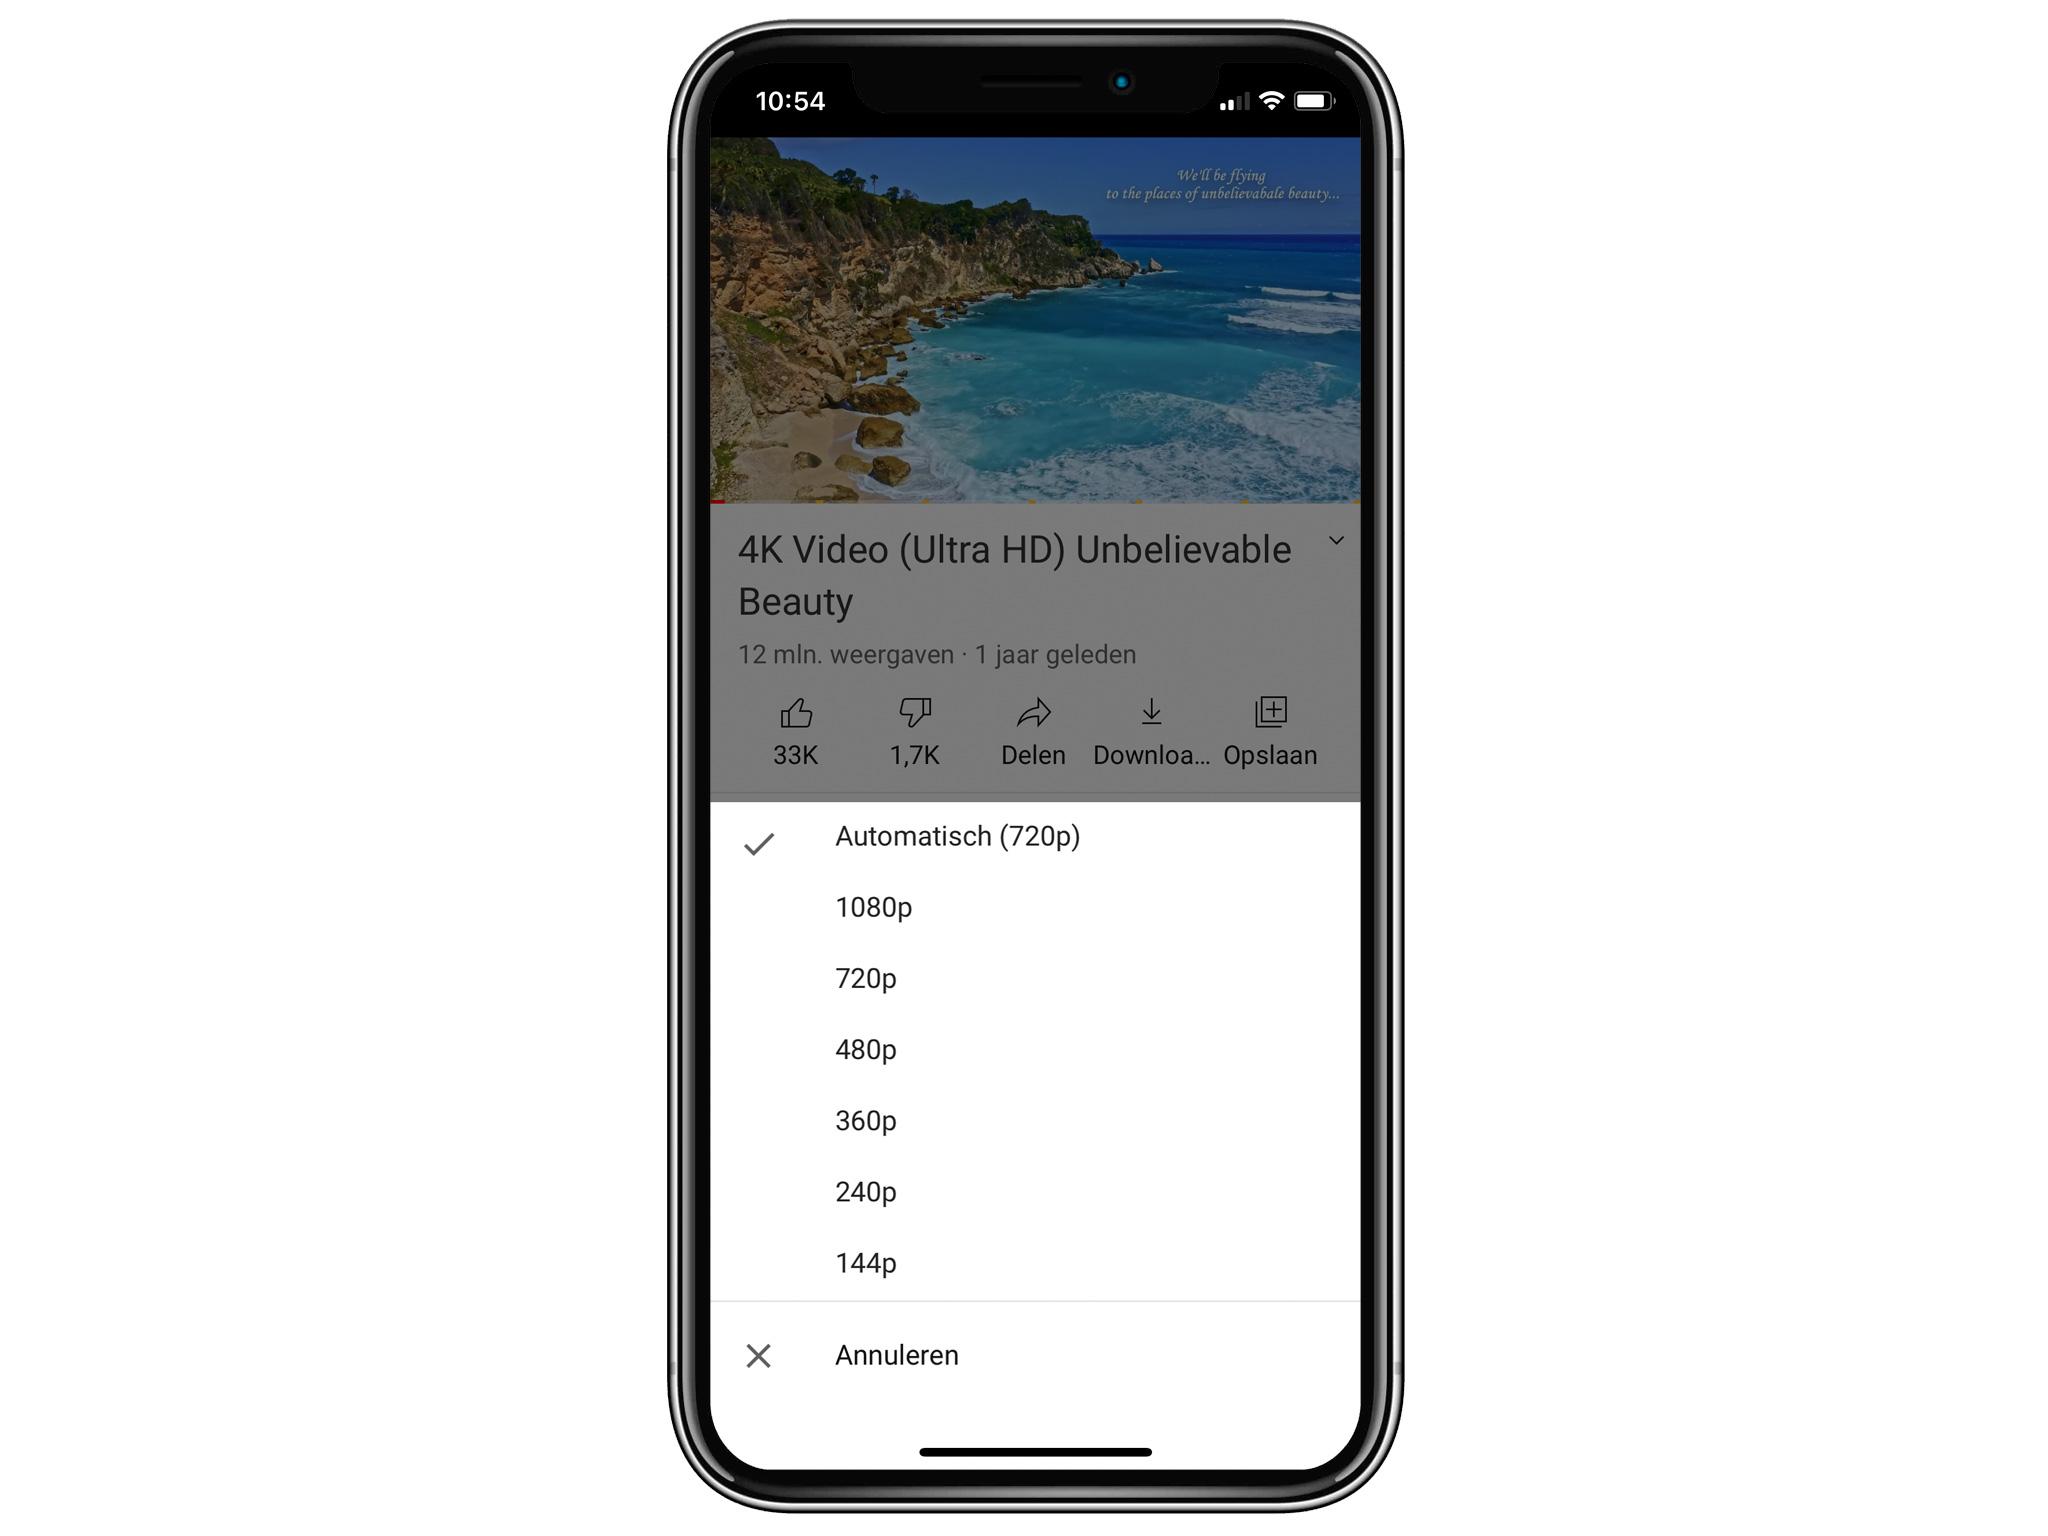 https://www.macfreak.nl/modules/news/images/zArt.iOS14YouTube1080pMax.jpg